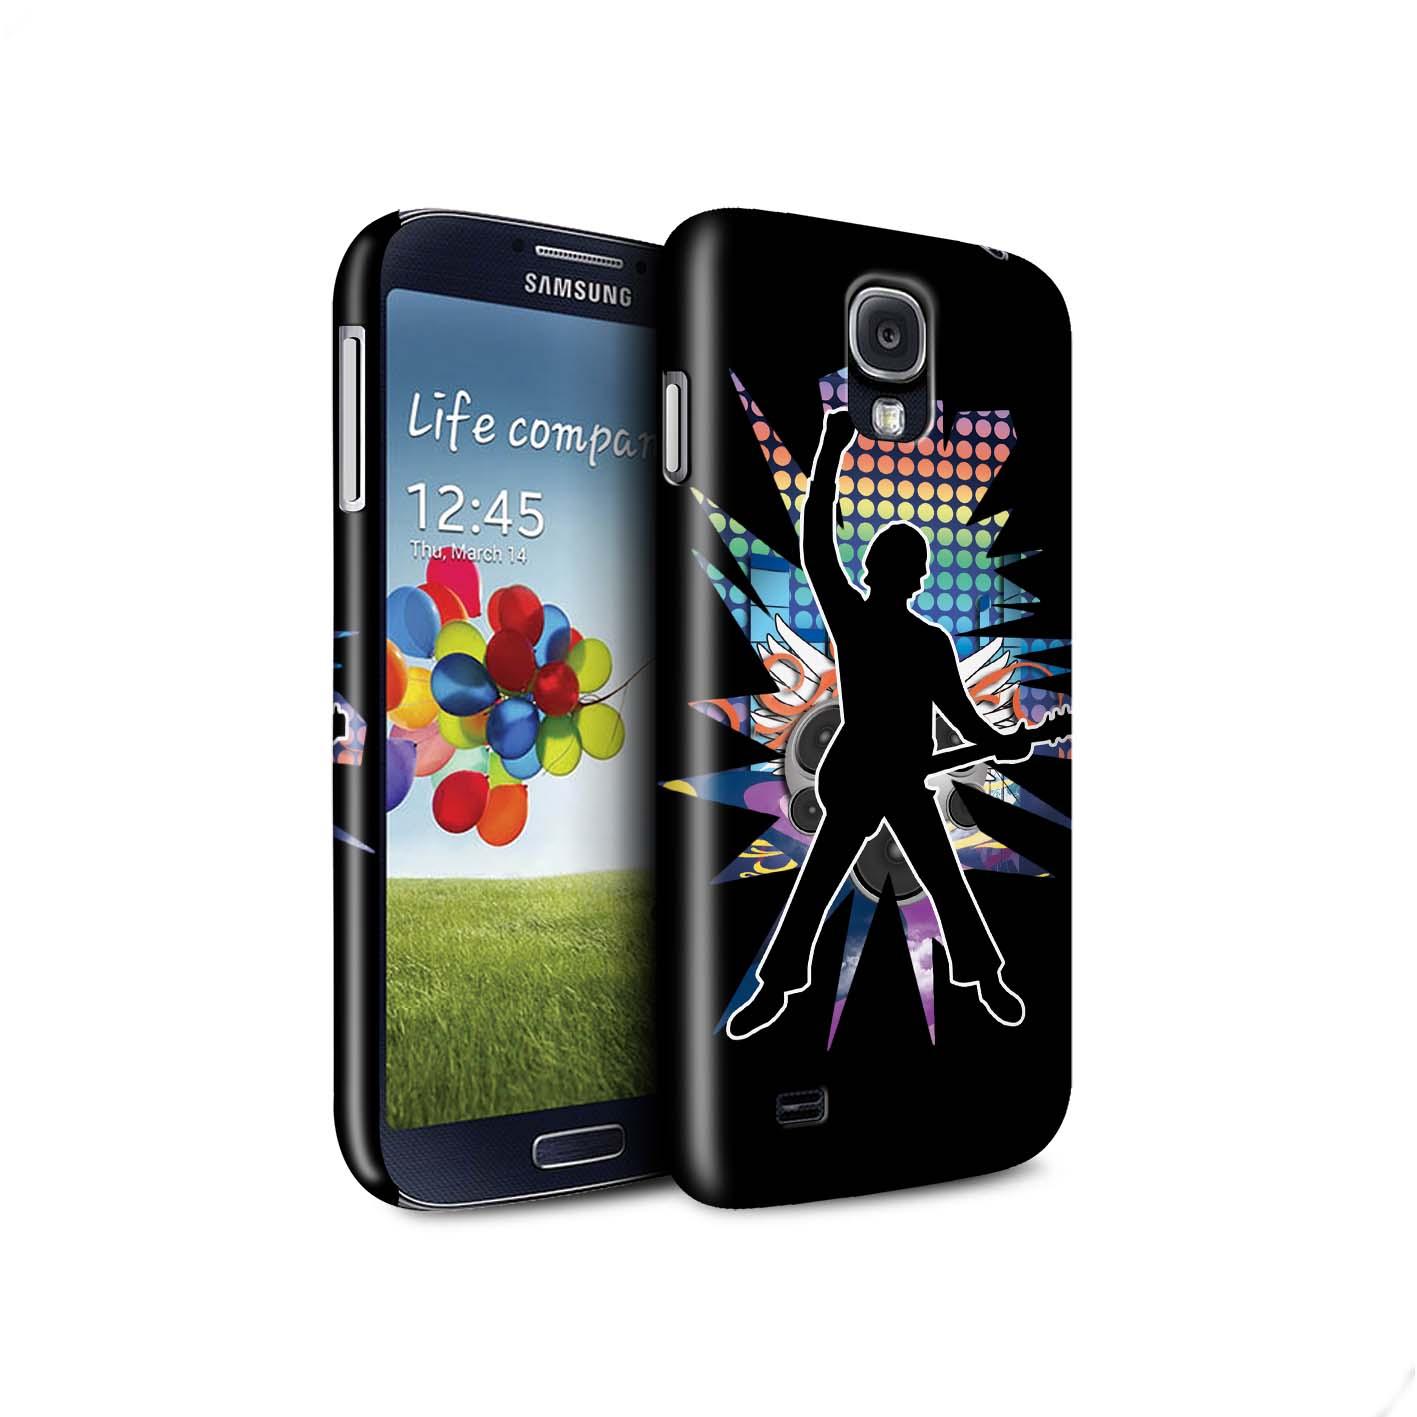 STUFF4-Matte-Phone-Case-for-Samsung-Galaxy-S4-SIV-Rock-Star-Pose